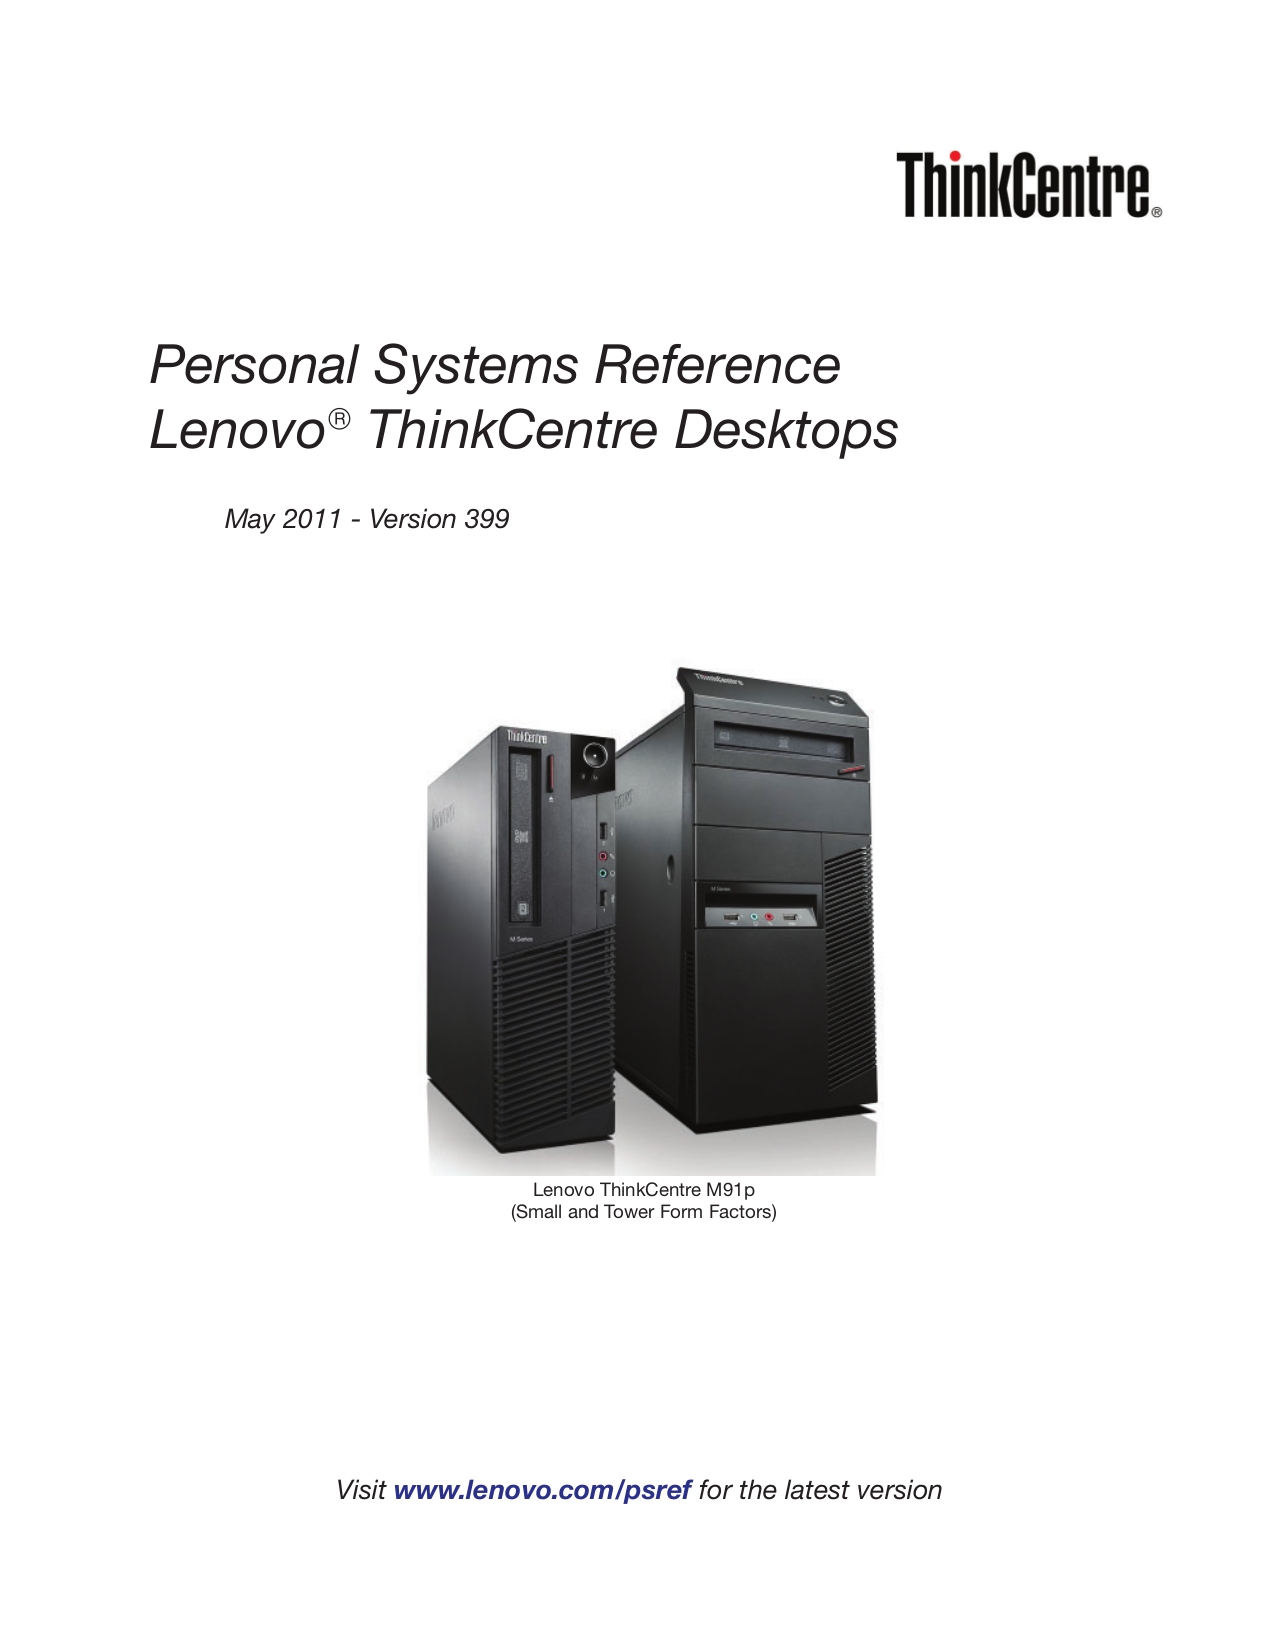 pdf for Lenovo Desktop ThinkCentre M58p 7220 manual